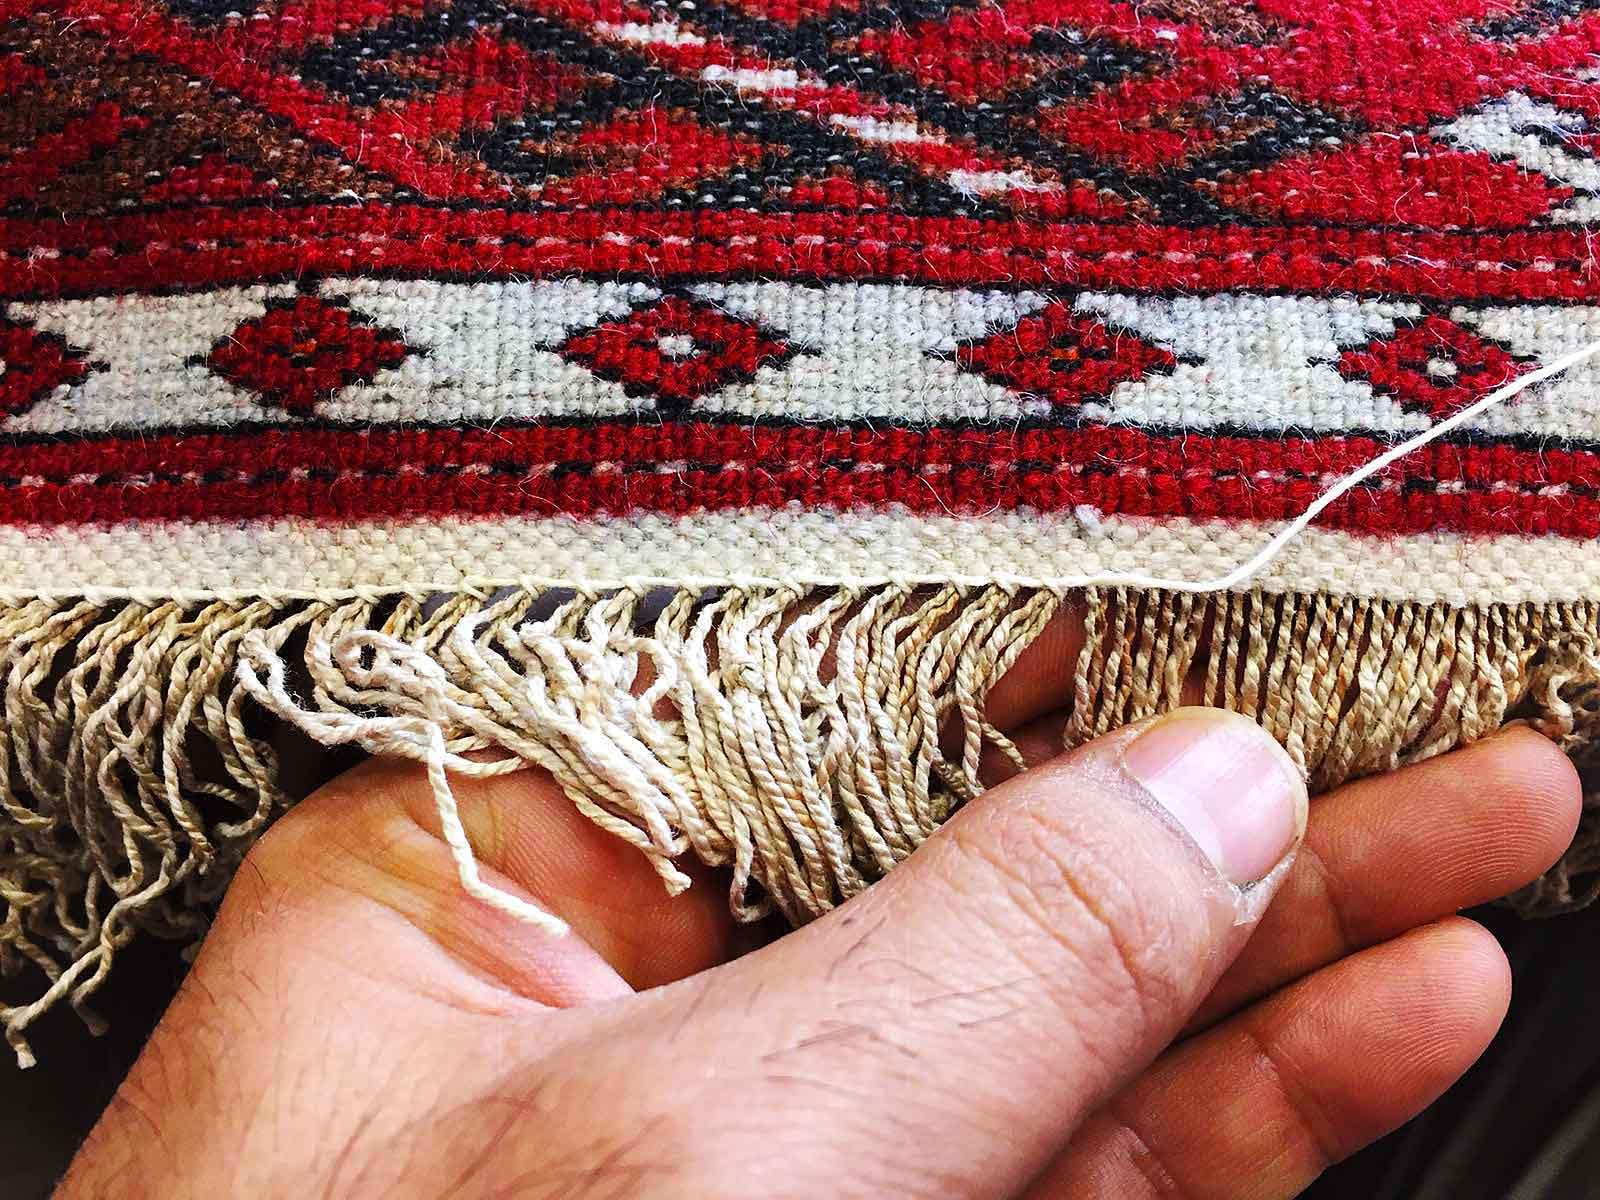 Rifacimento frange tappeto persiano a Milano